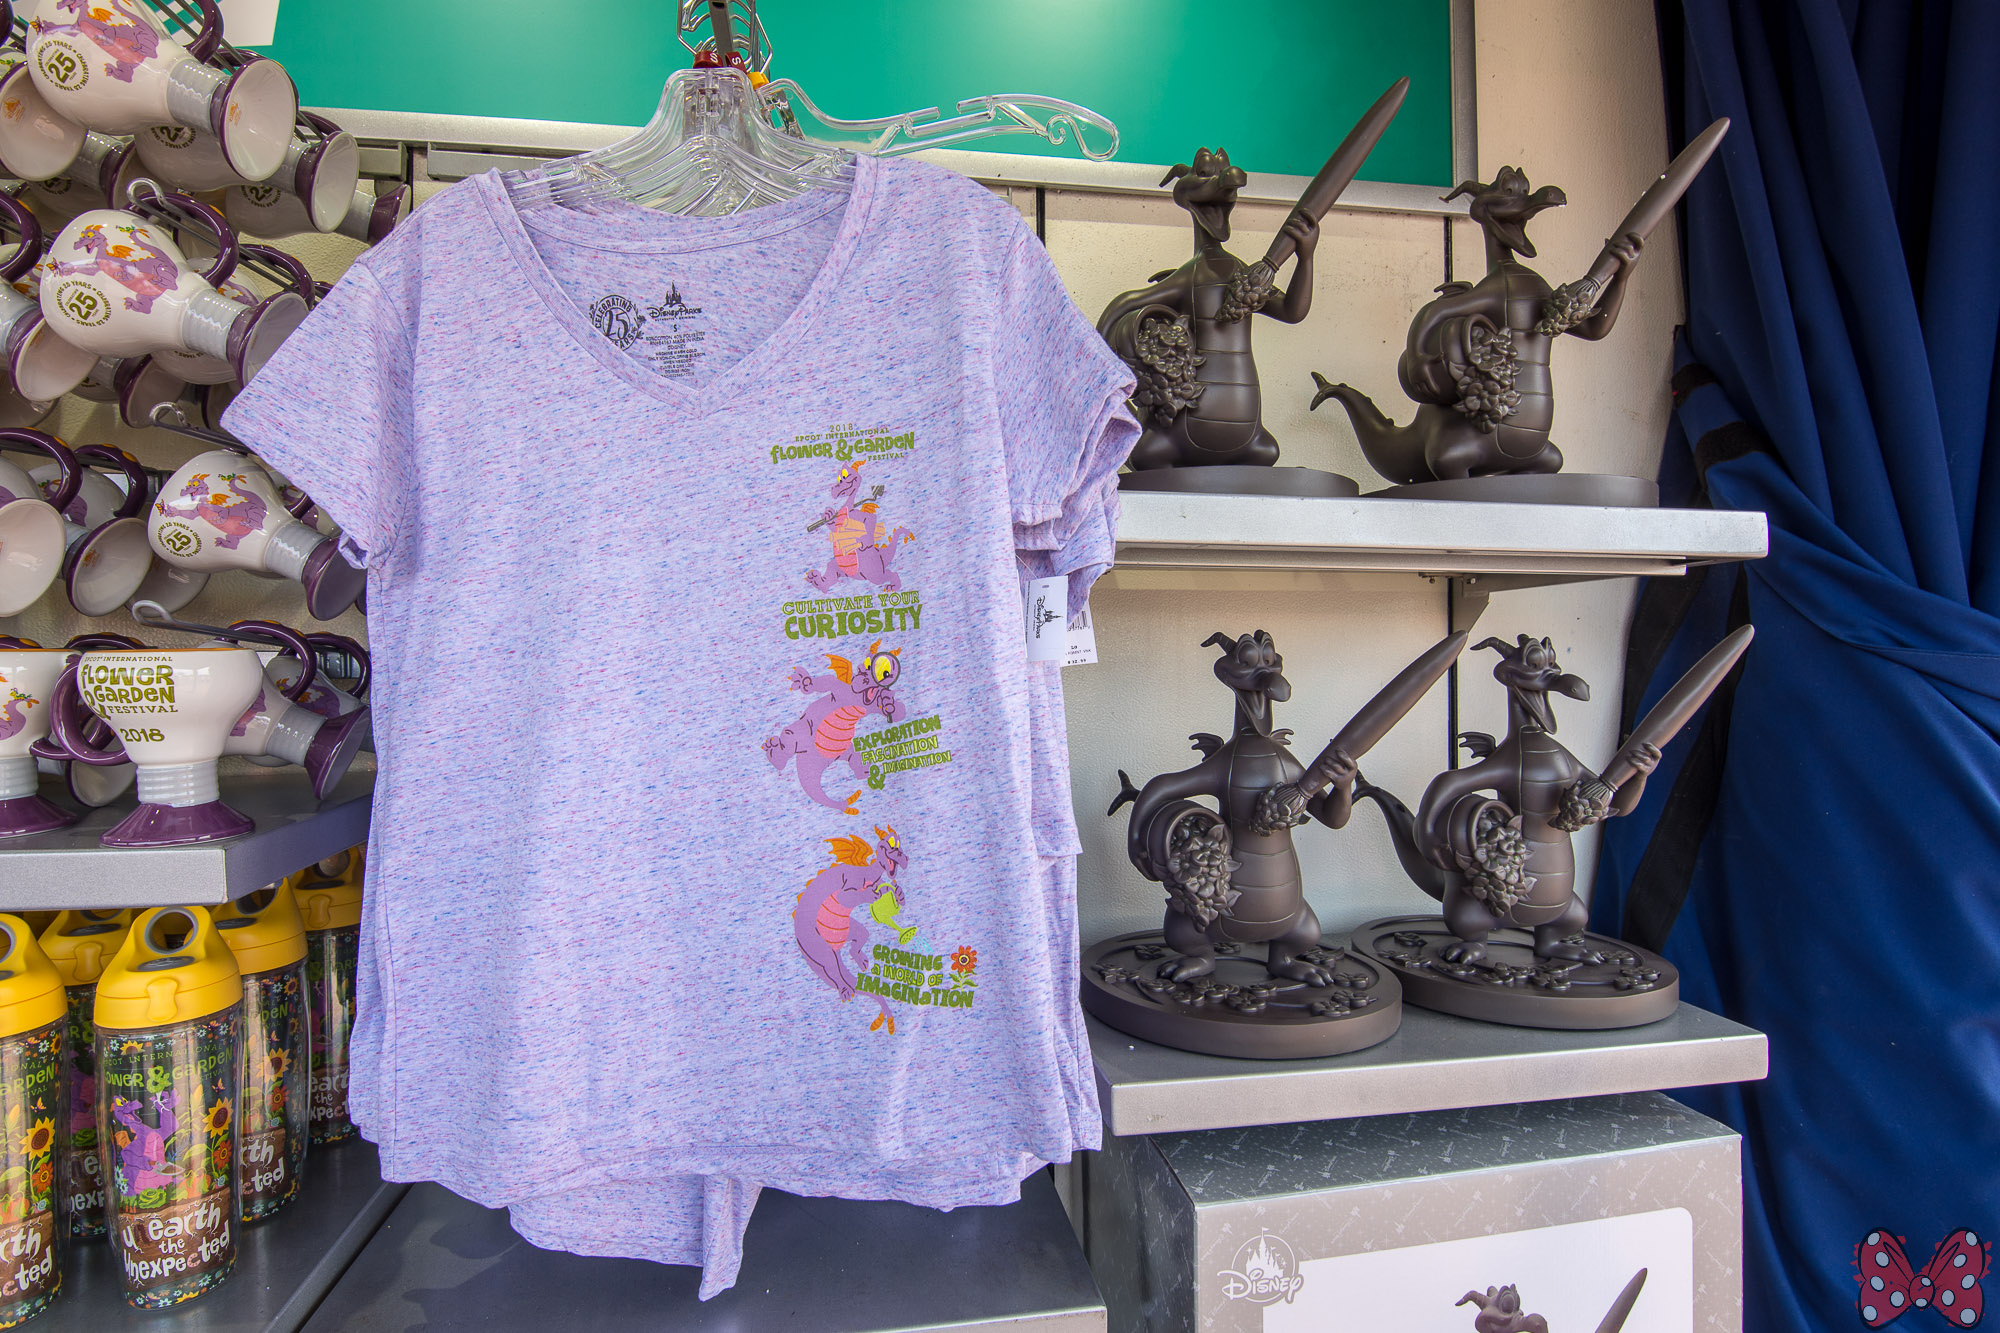 photos: 2018 epcot flower and garden festival merchandise - blog mickey